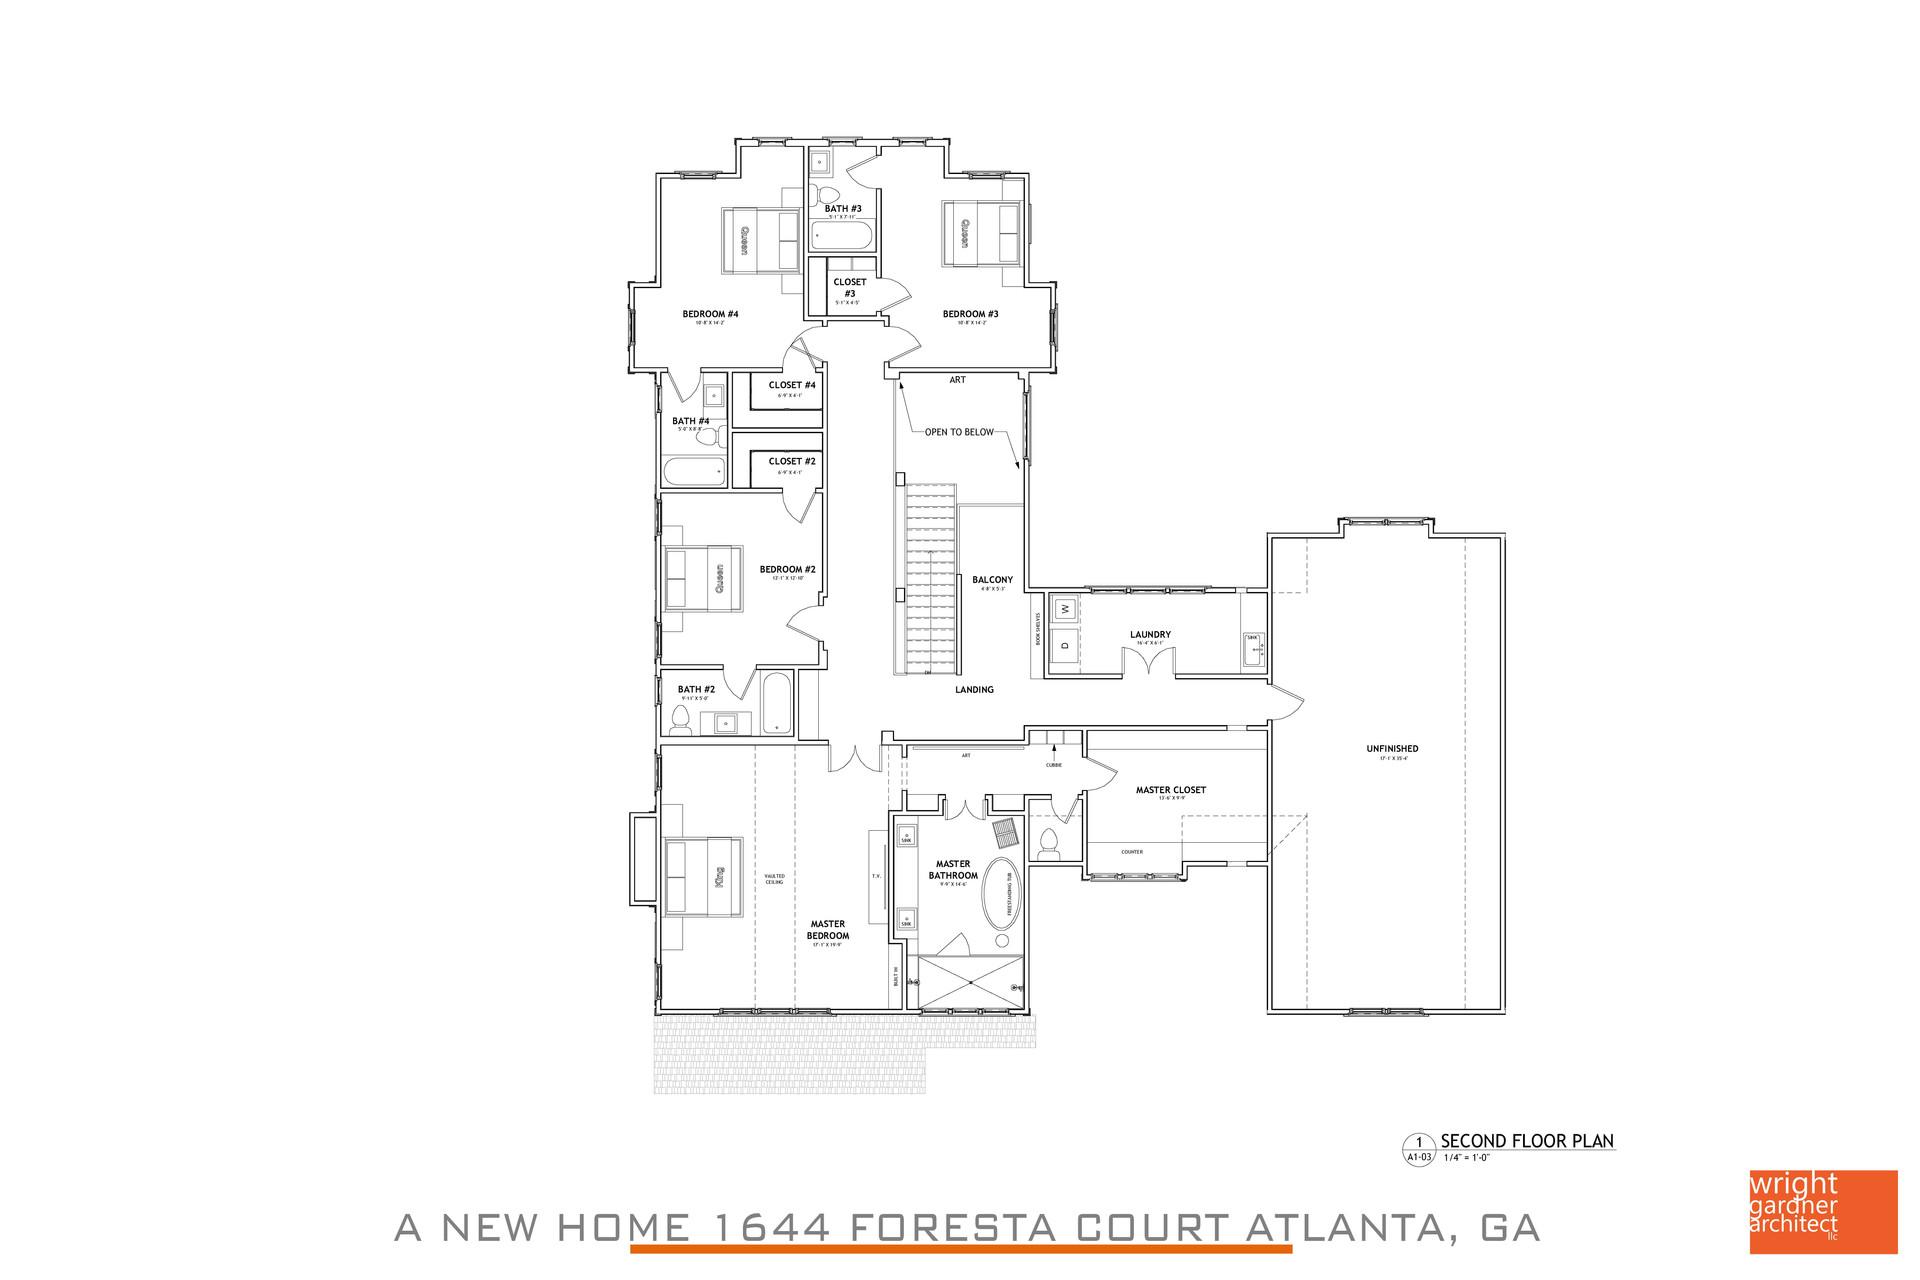 1644 Foresta Park  Plans_Page_3.jpg